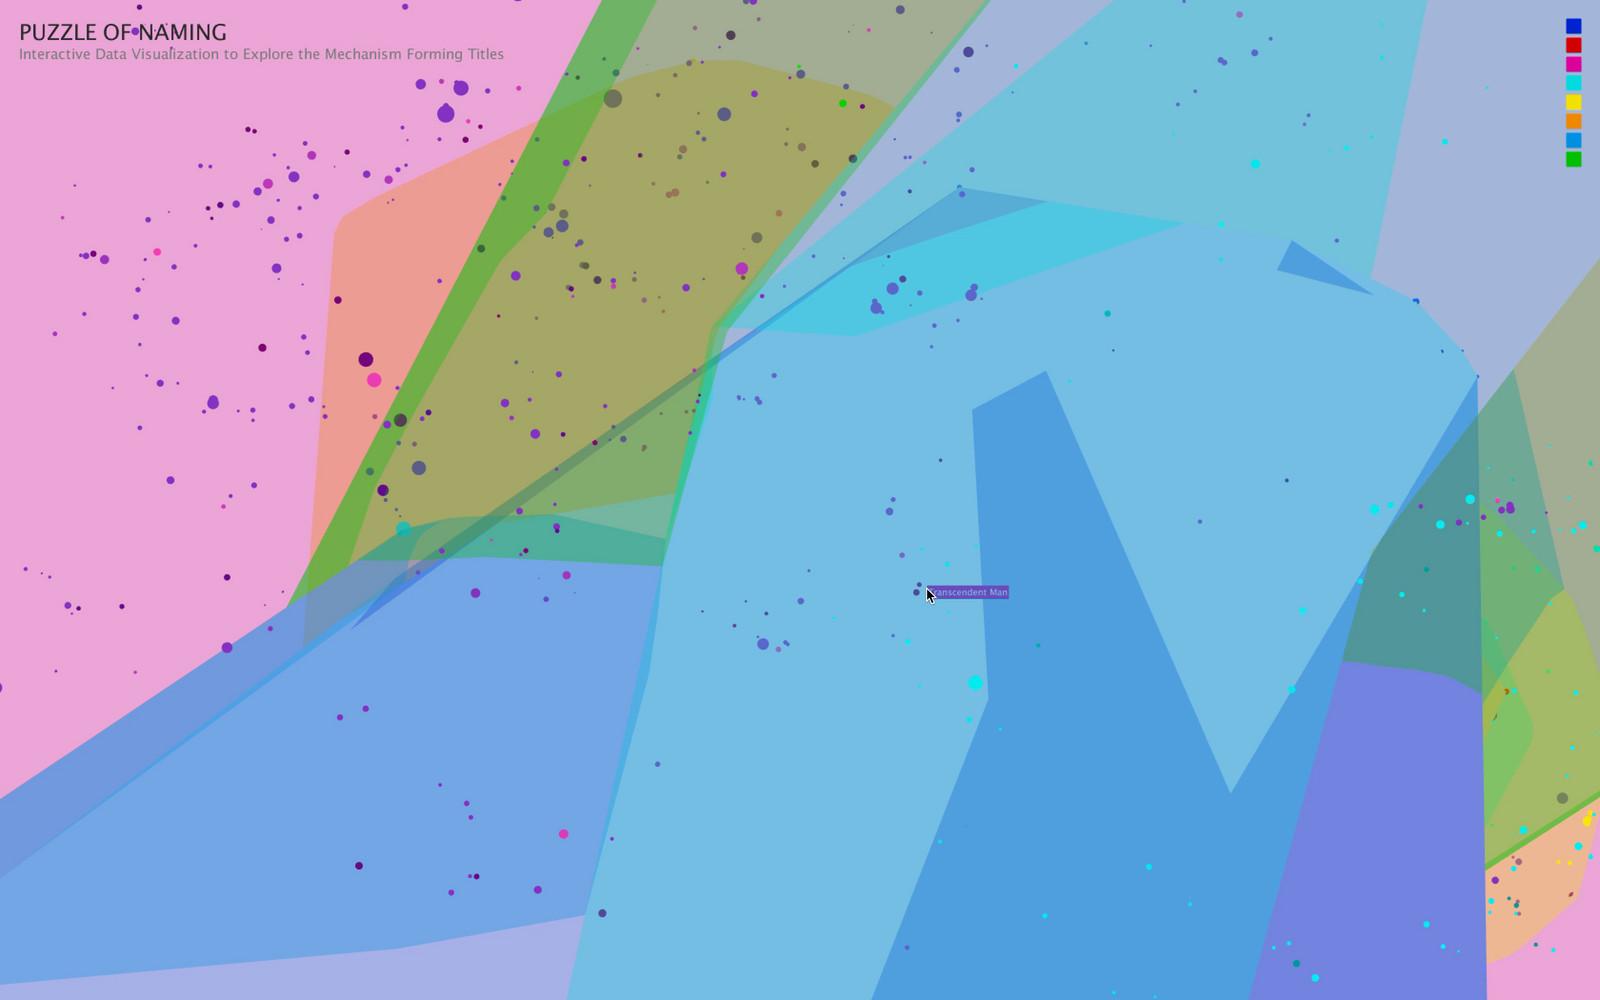 LuLiu | Puzzle of Naming | Film Title Data Visualization